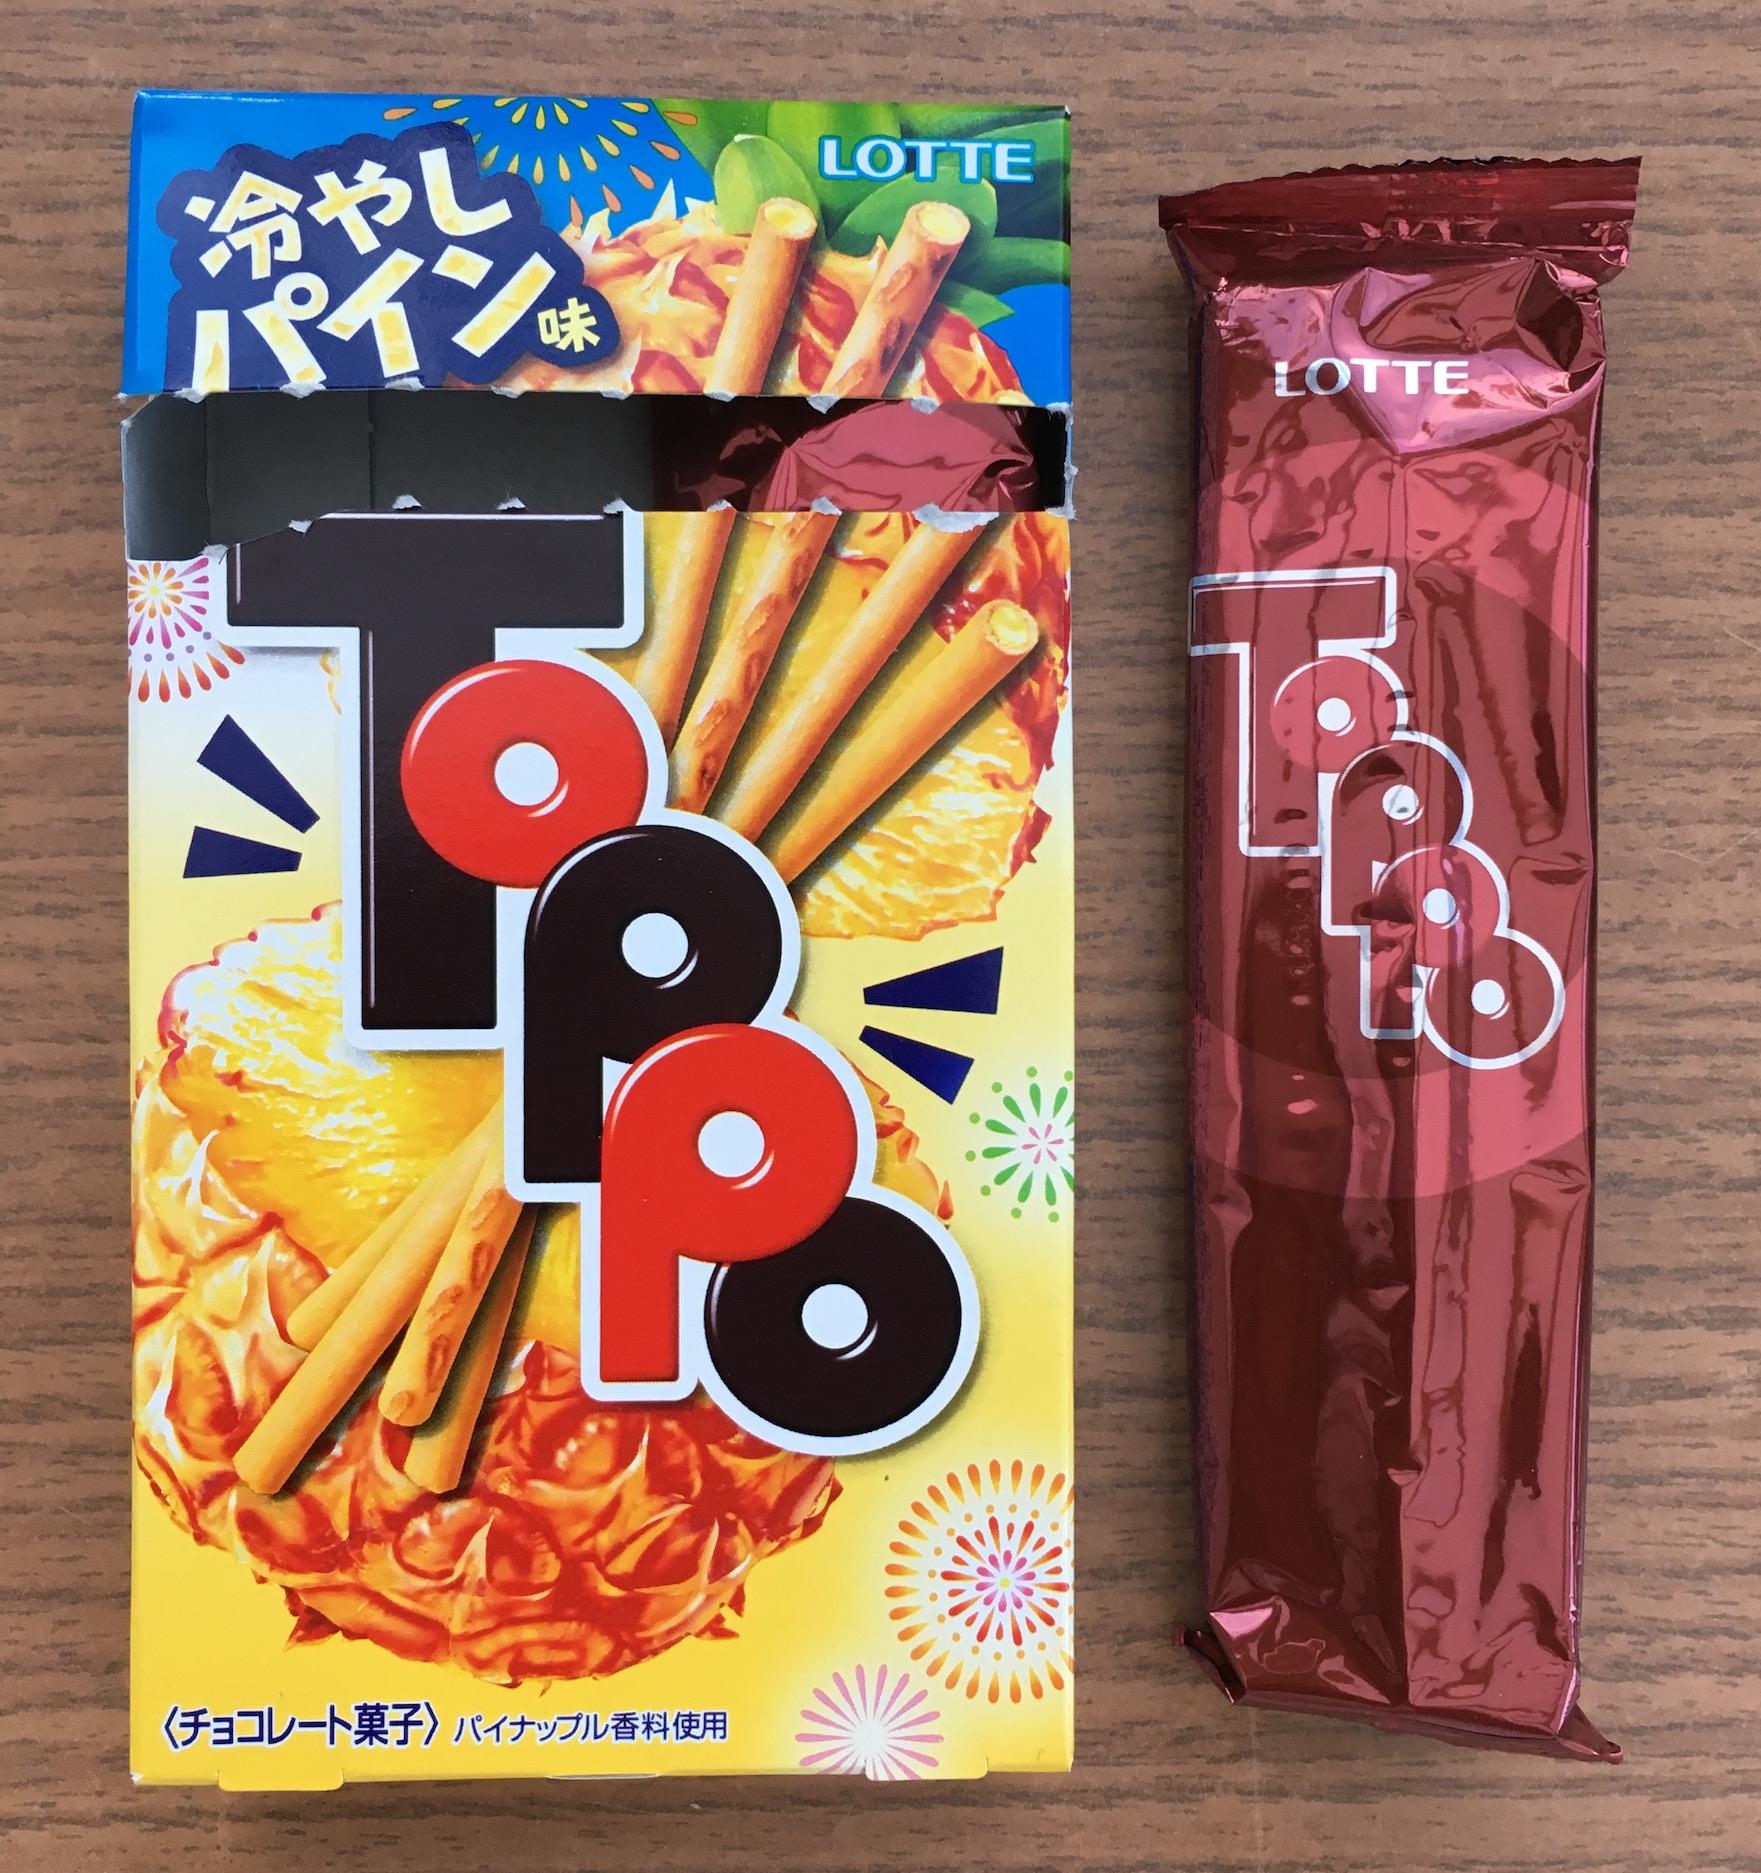 Toppo Ananas